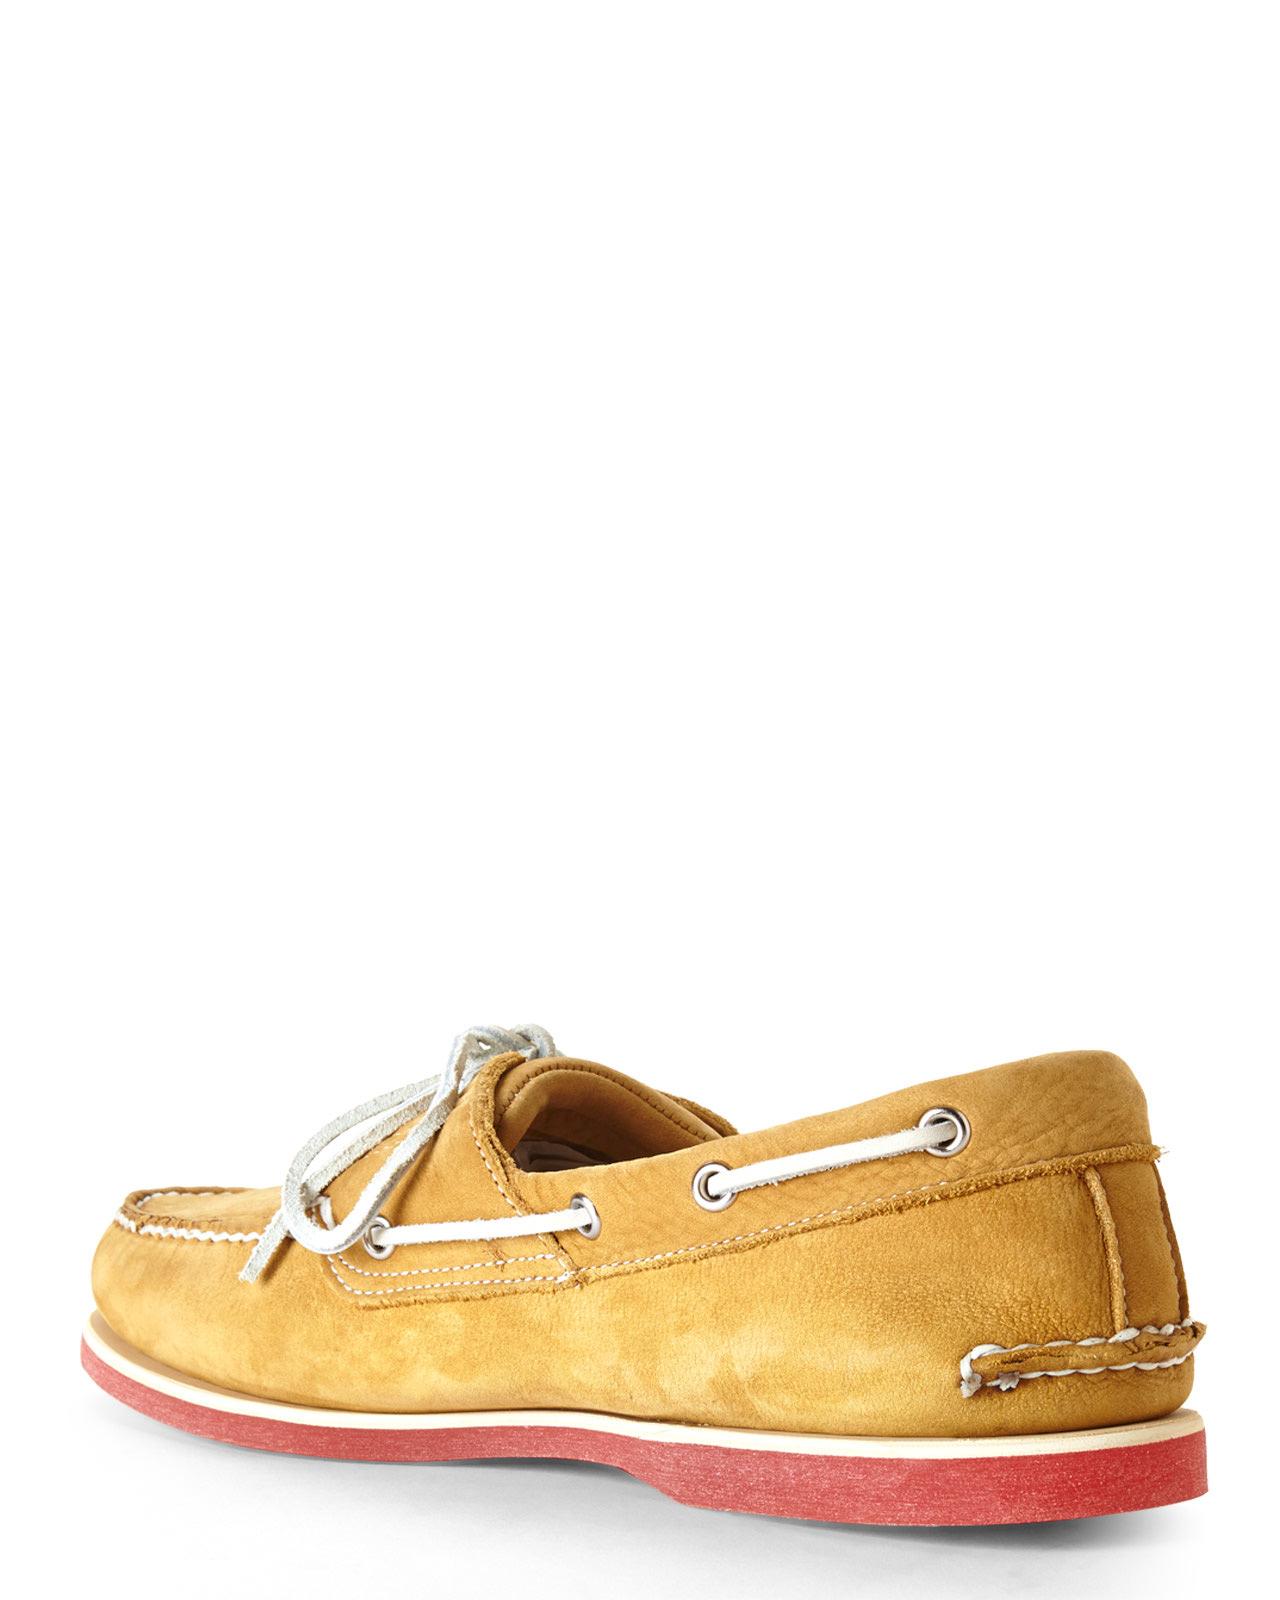 Timberland Boat Shoes Heel Slip